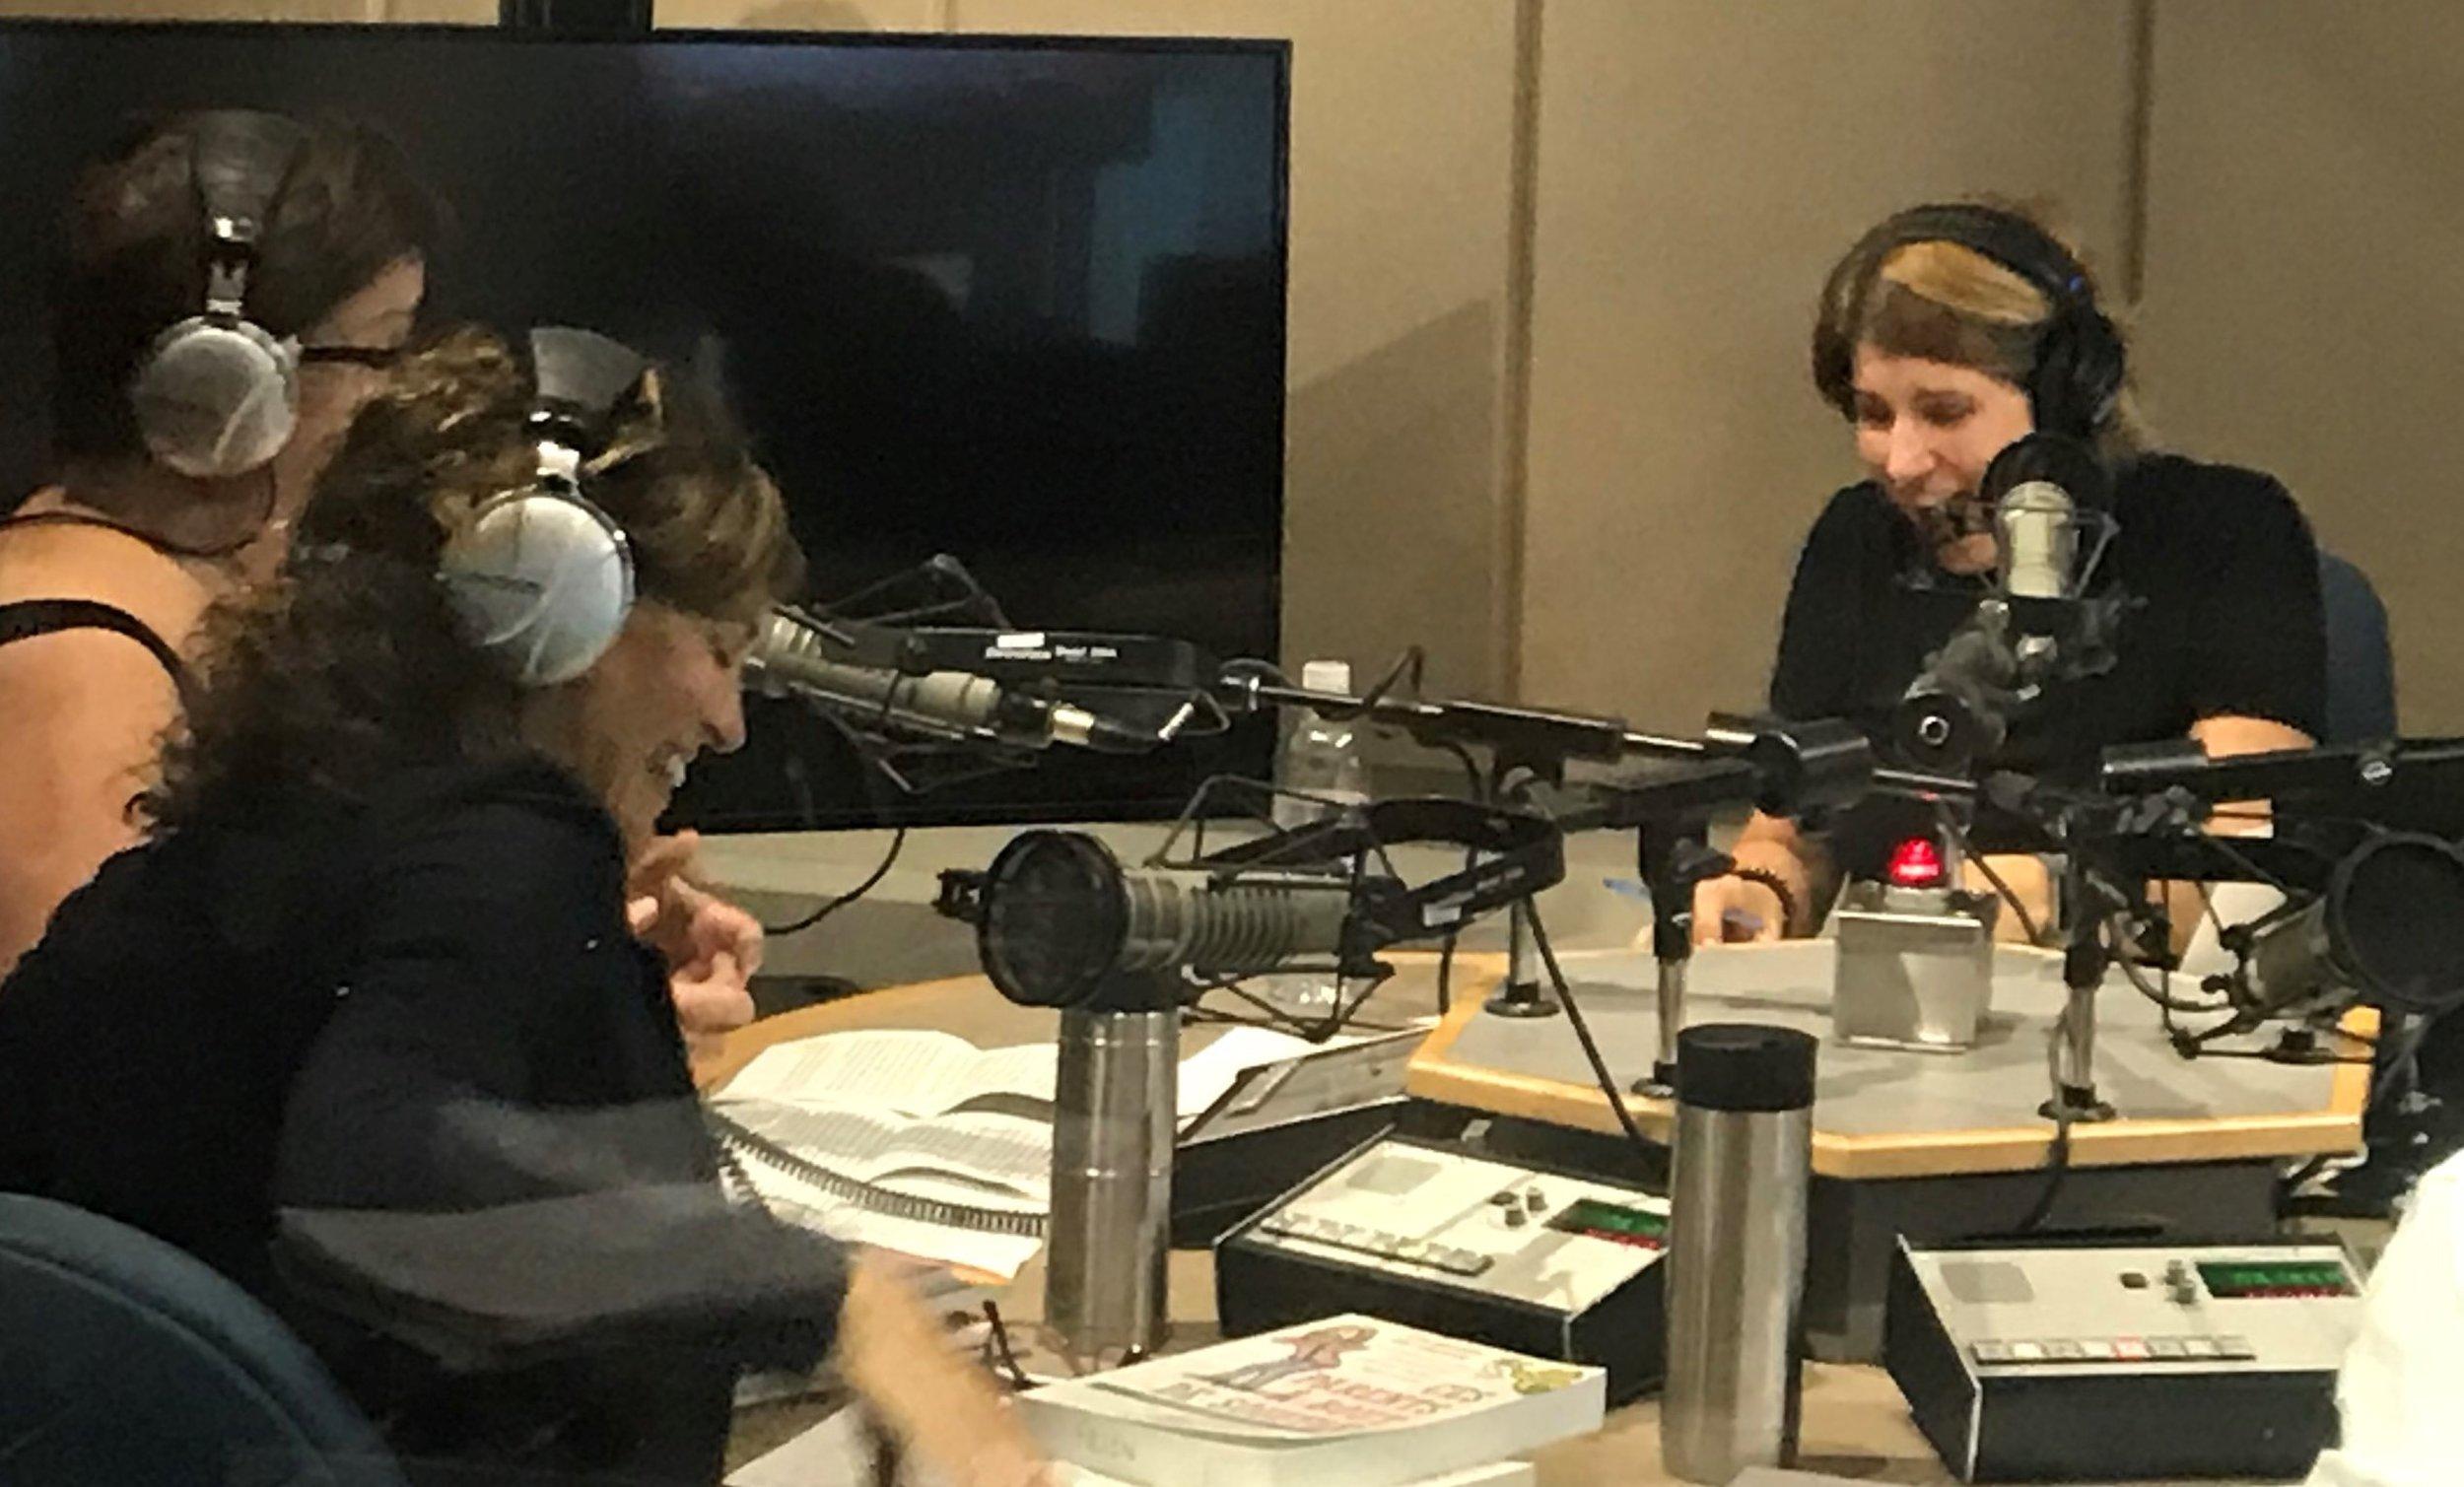 FR - Les Malins avec Jhade Montpetit, Radio-Canada Ottawa-Gatineau -  Rentrée et zénitude  | 2018 08 25